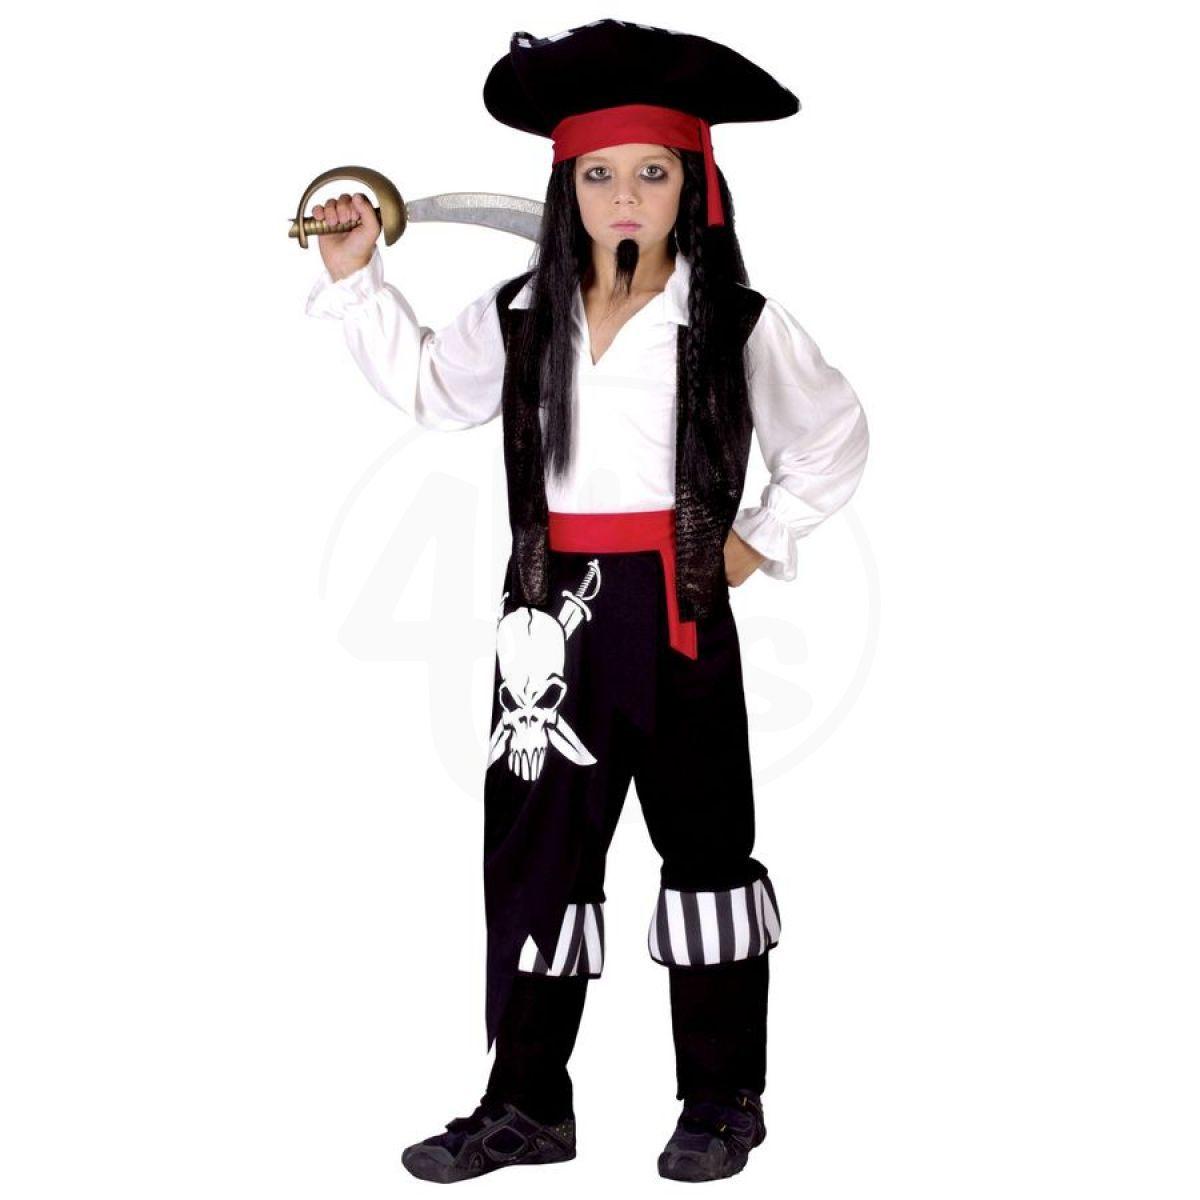 d8472a1d020c Pirat kostym pro deti levně